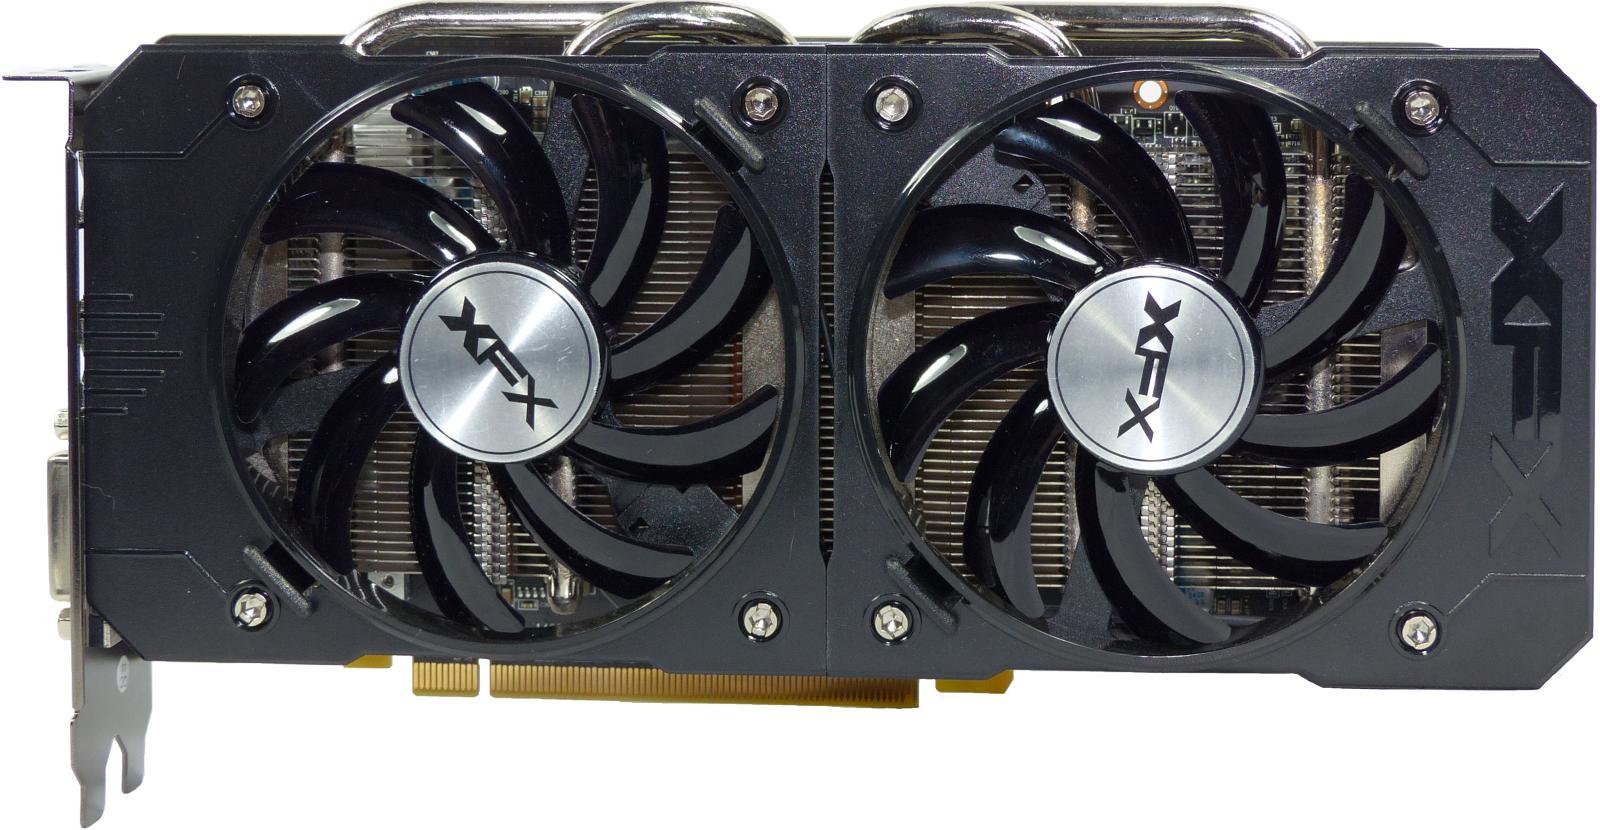 XFX Radeon R9 380 Double Dissipation